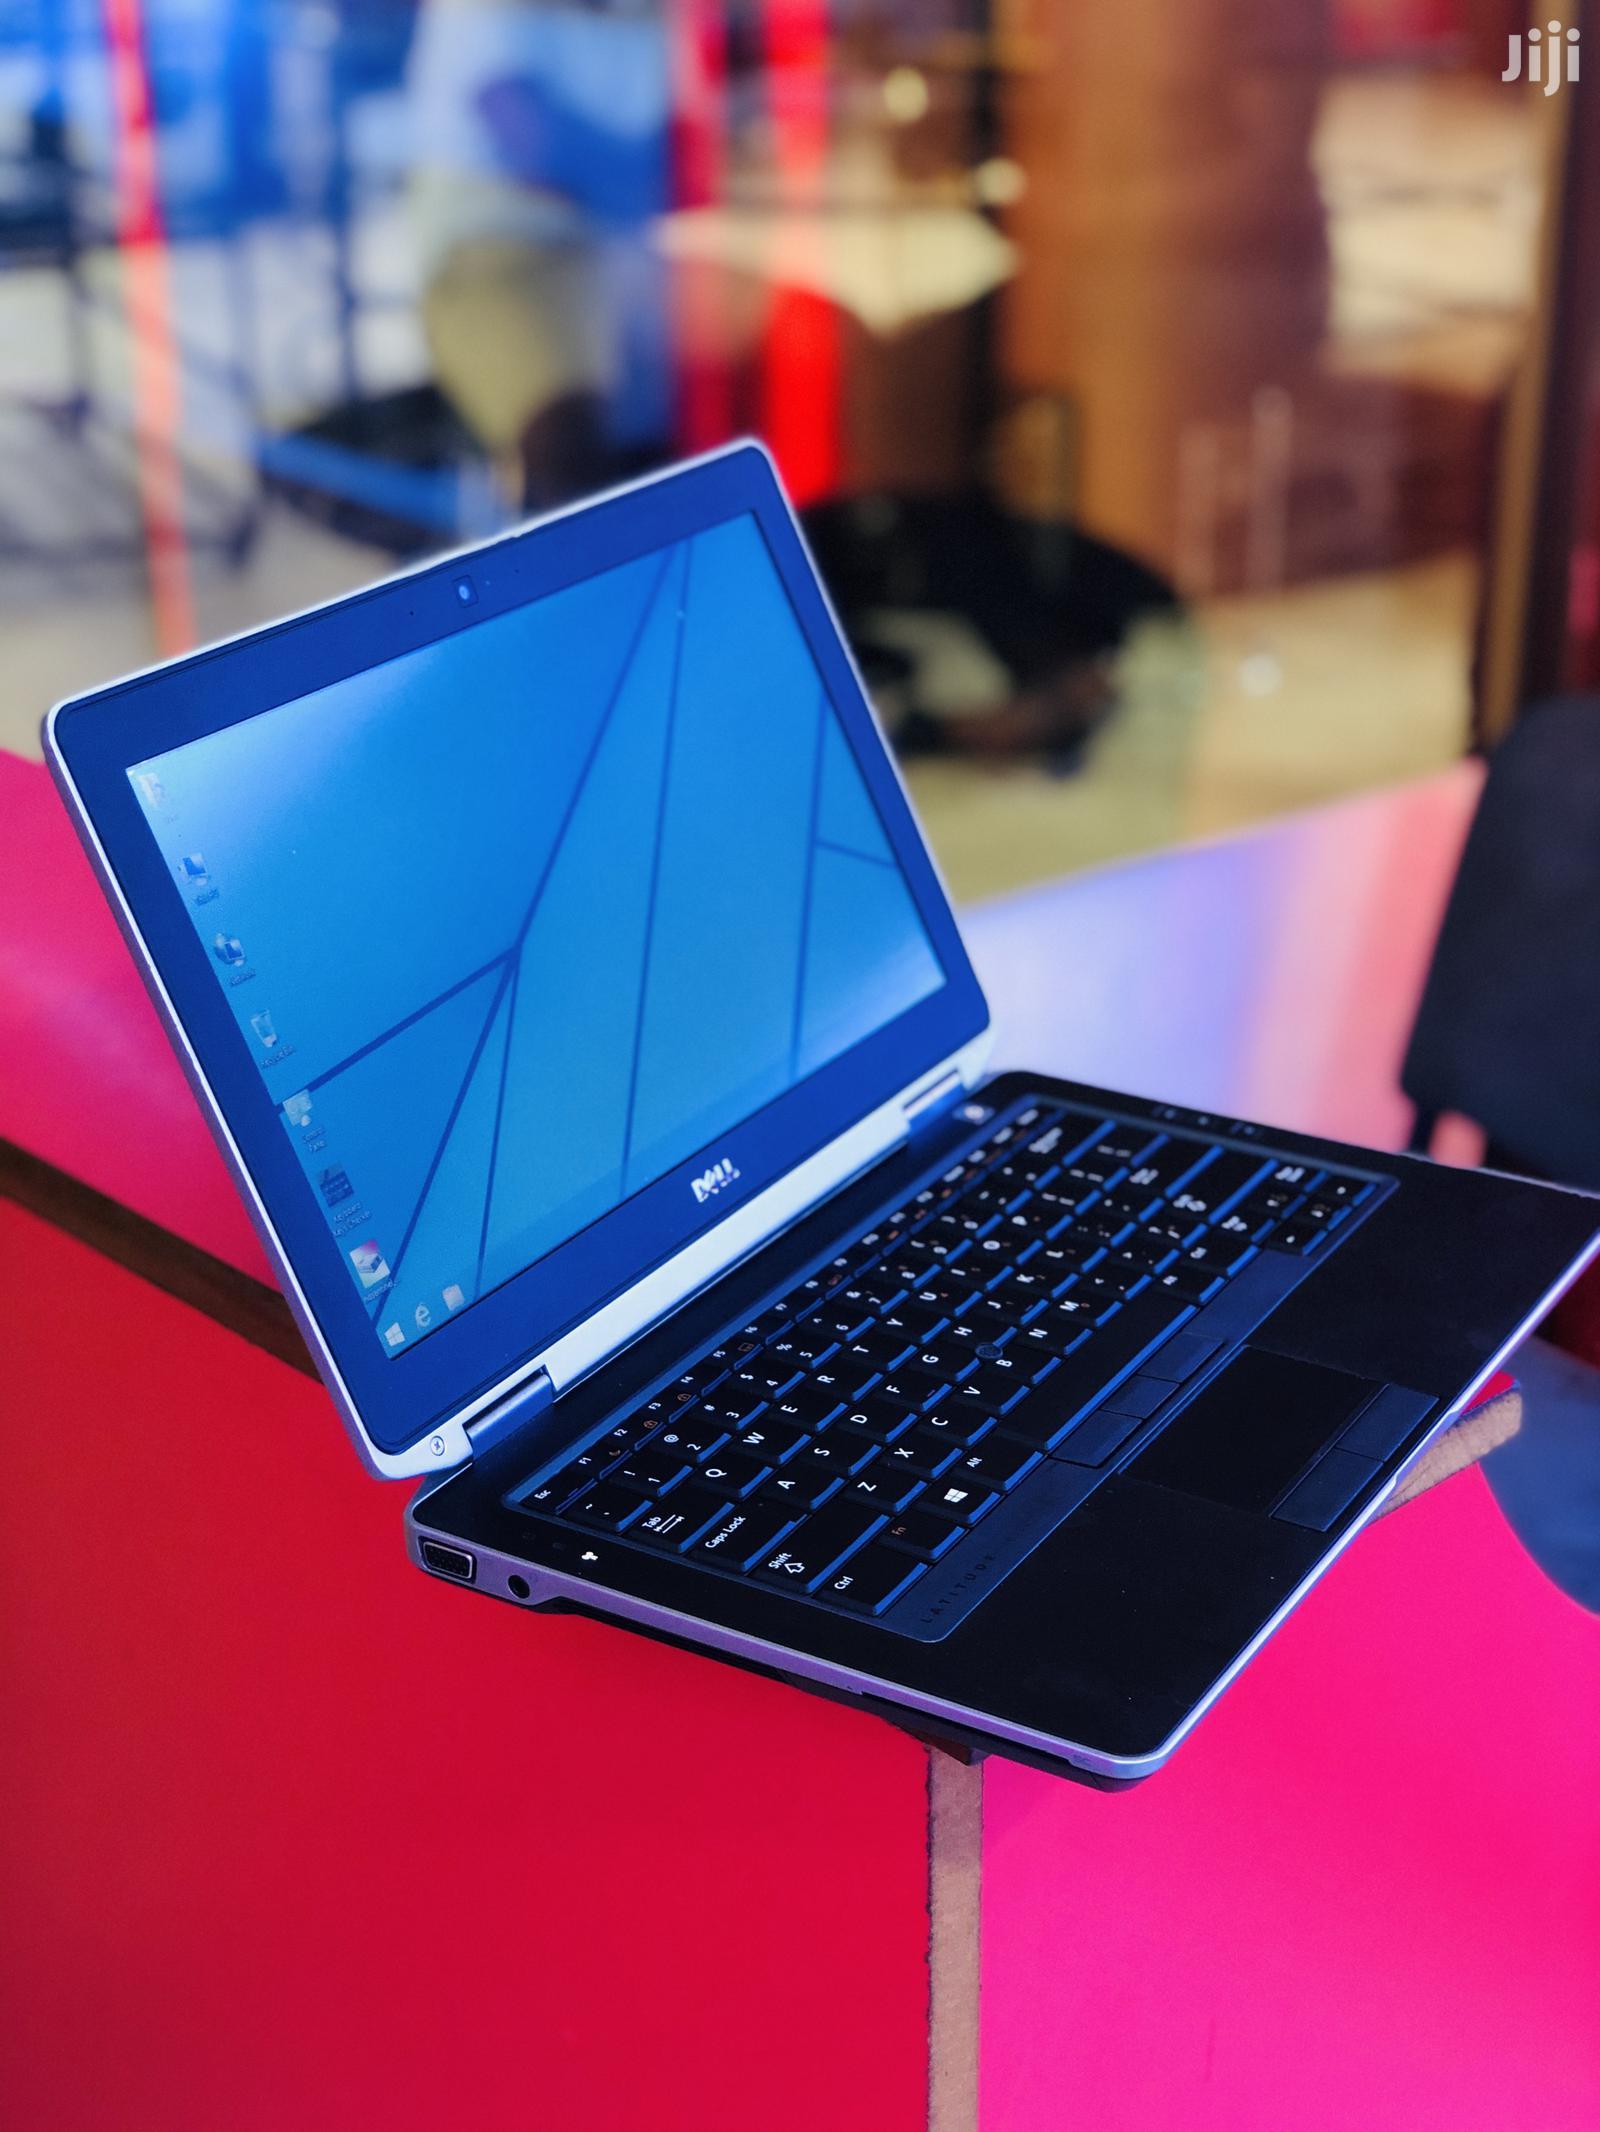 Laptop Dell Latitude E6330 4GB Intel Core I7 HDD 500GB | Laptops & Computers for sale in Kampala, Central Region, Uganda